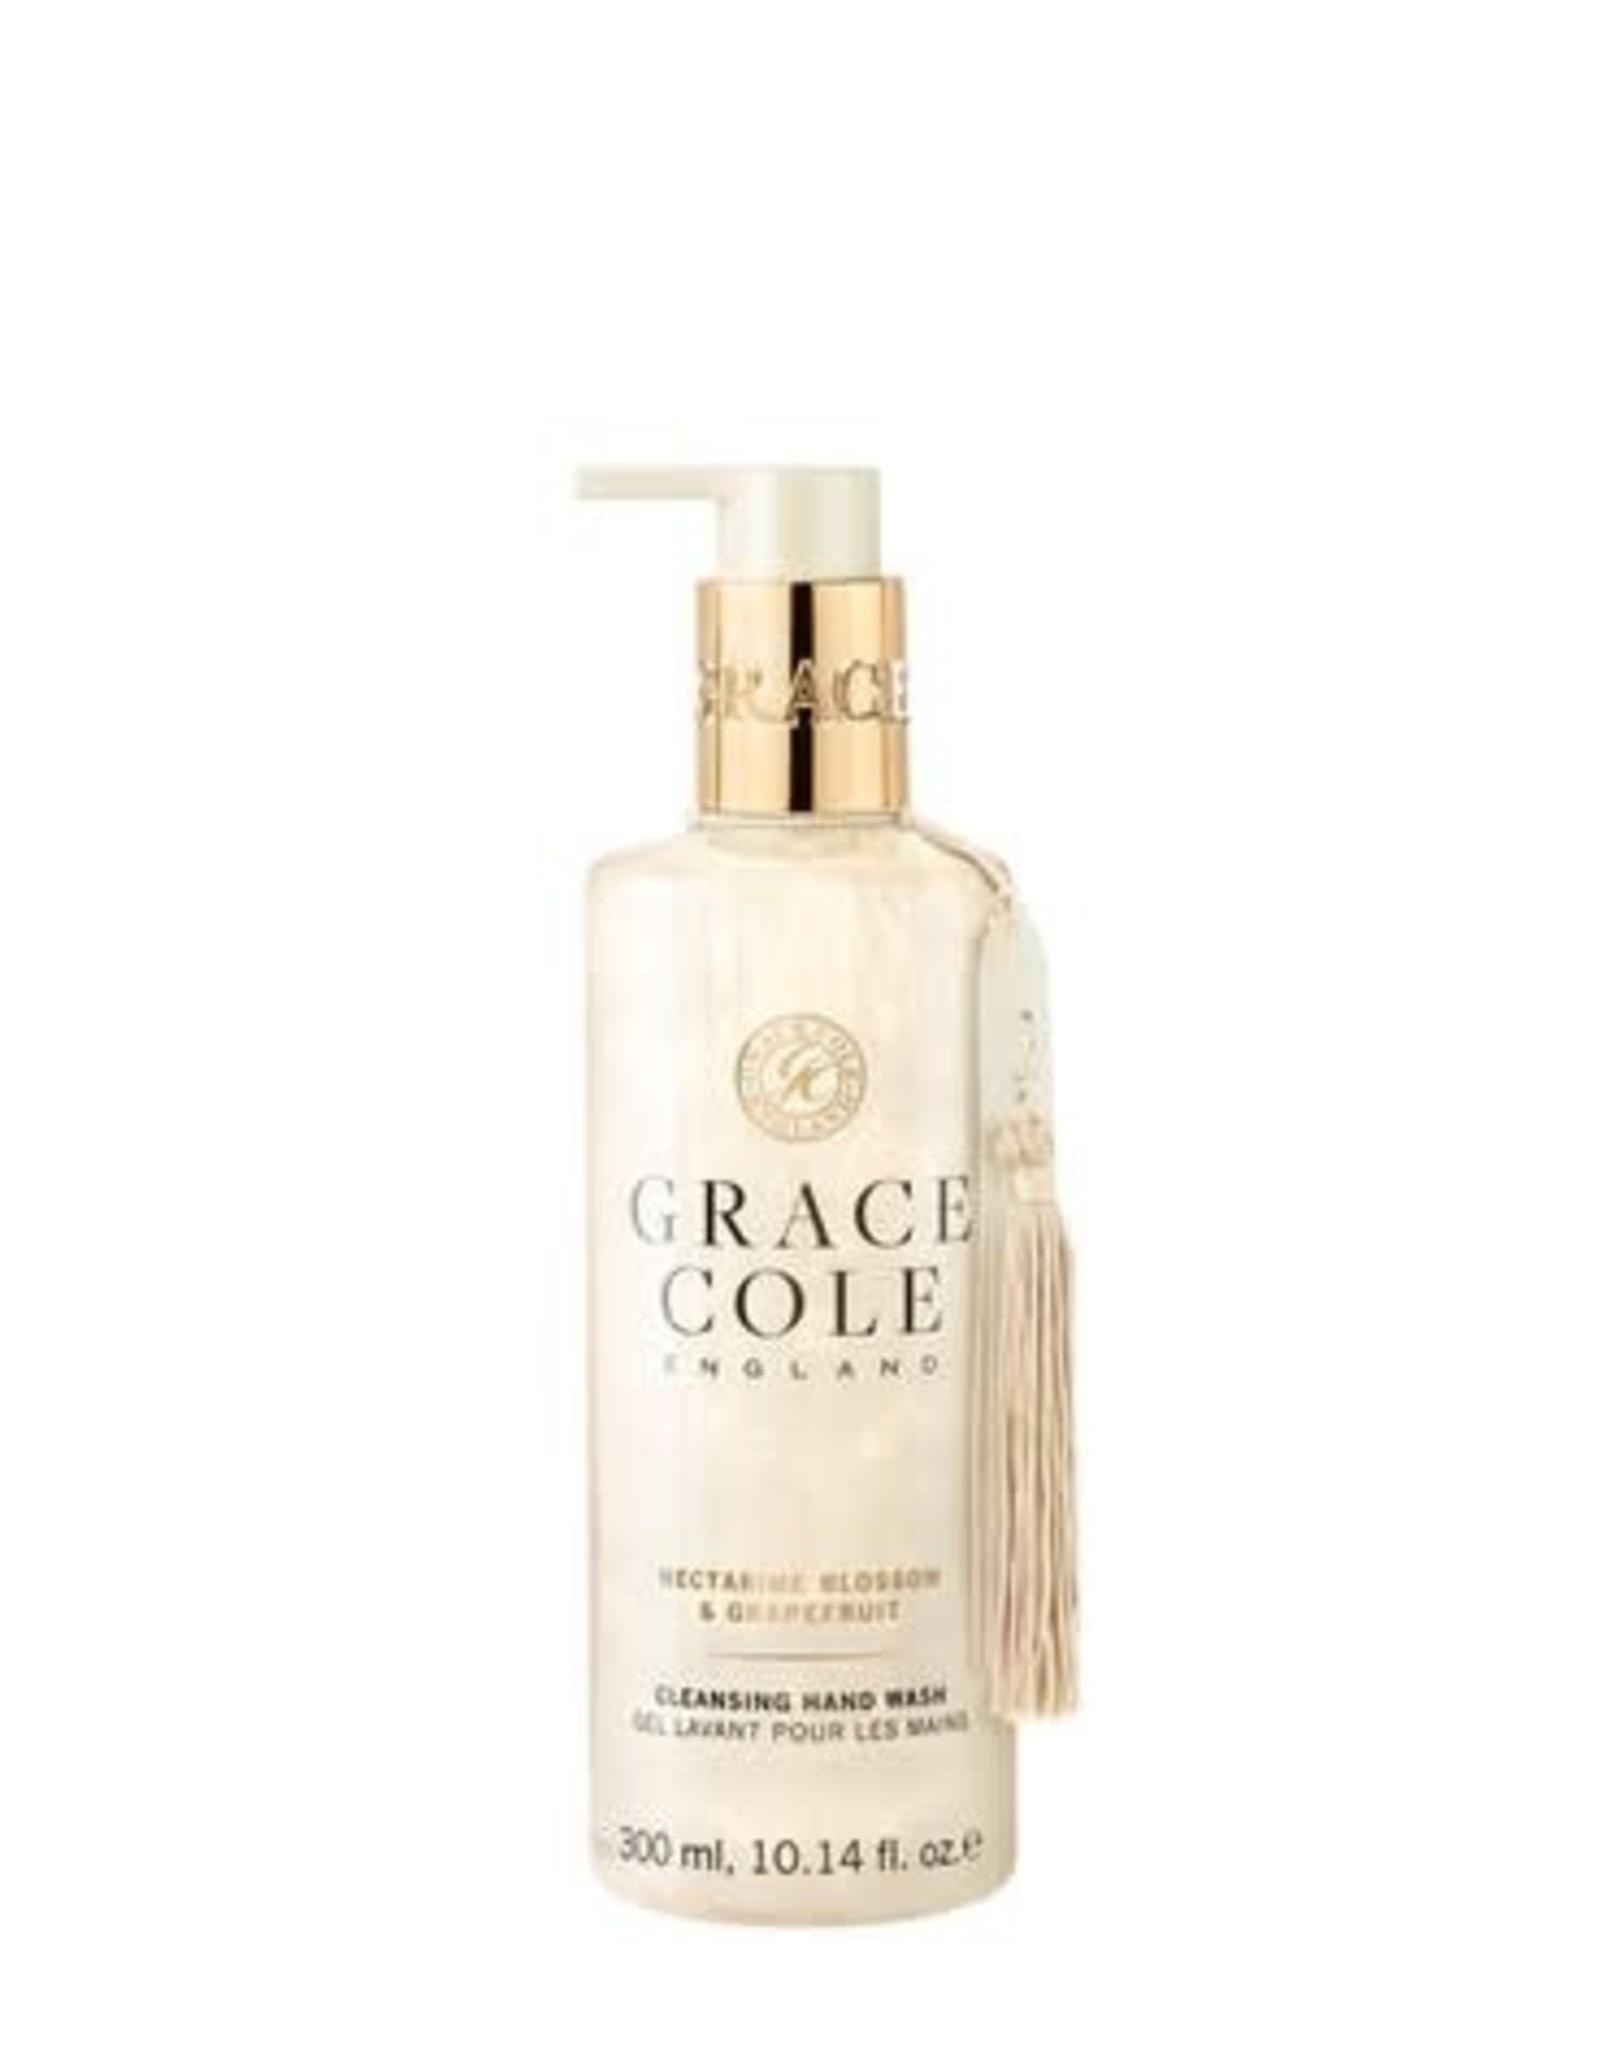 Grace Cole Hand Wash Nect.Blossom&Grapefruit